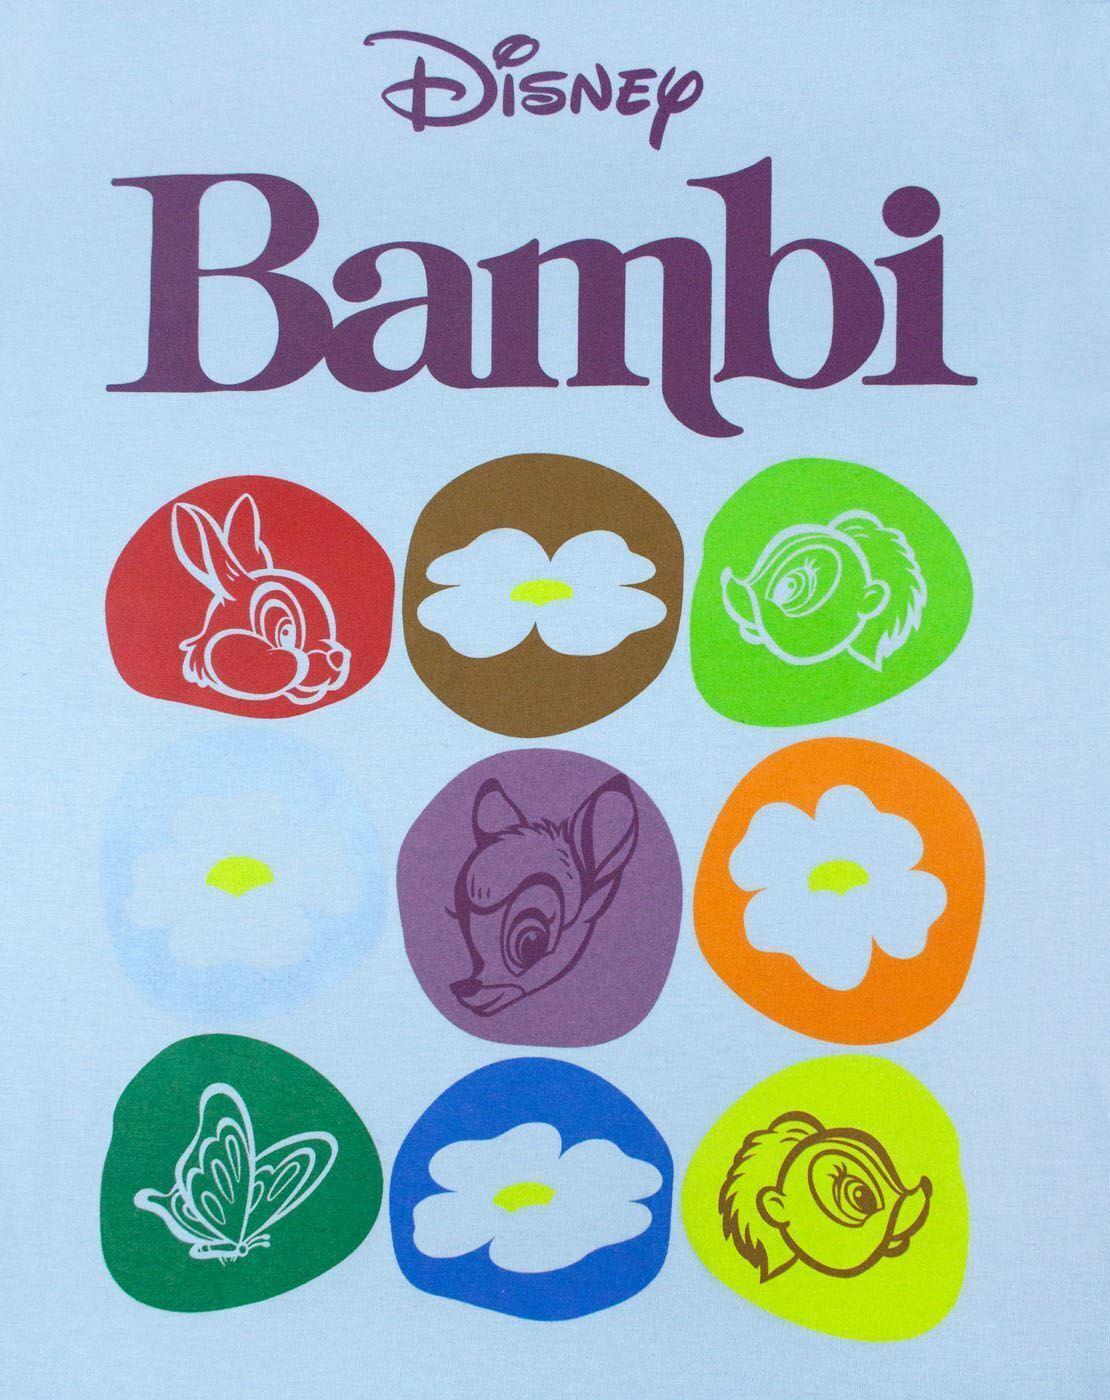 Disney-Bambi-Motif-Blue-Women-039-s-T-Shirt thumbnail 6